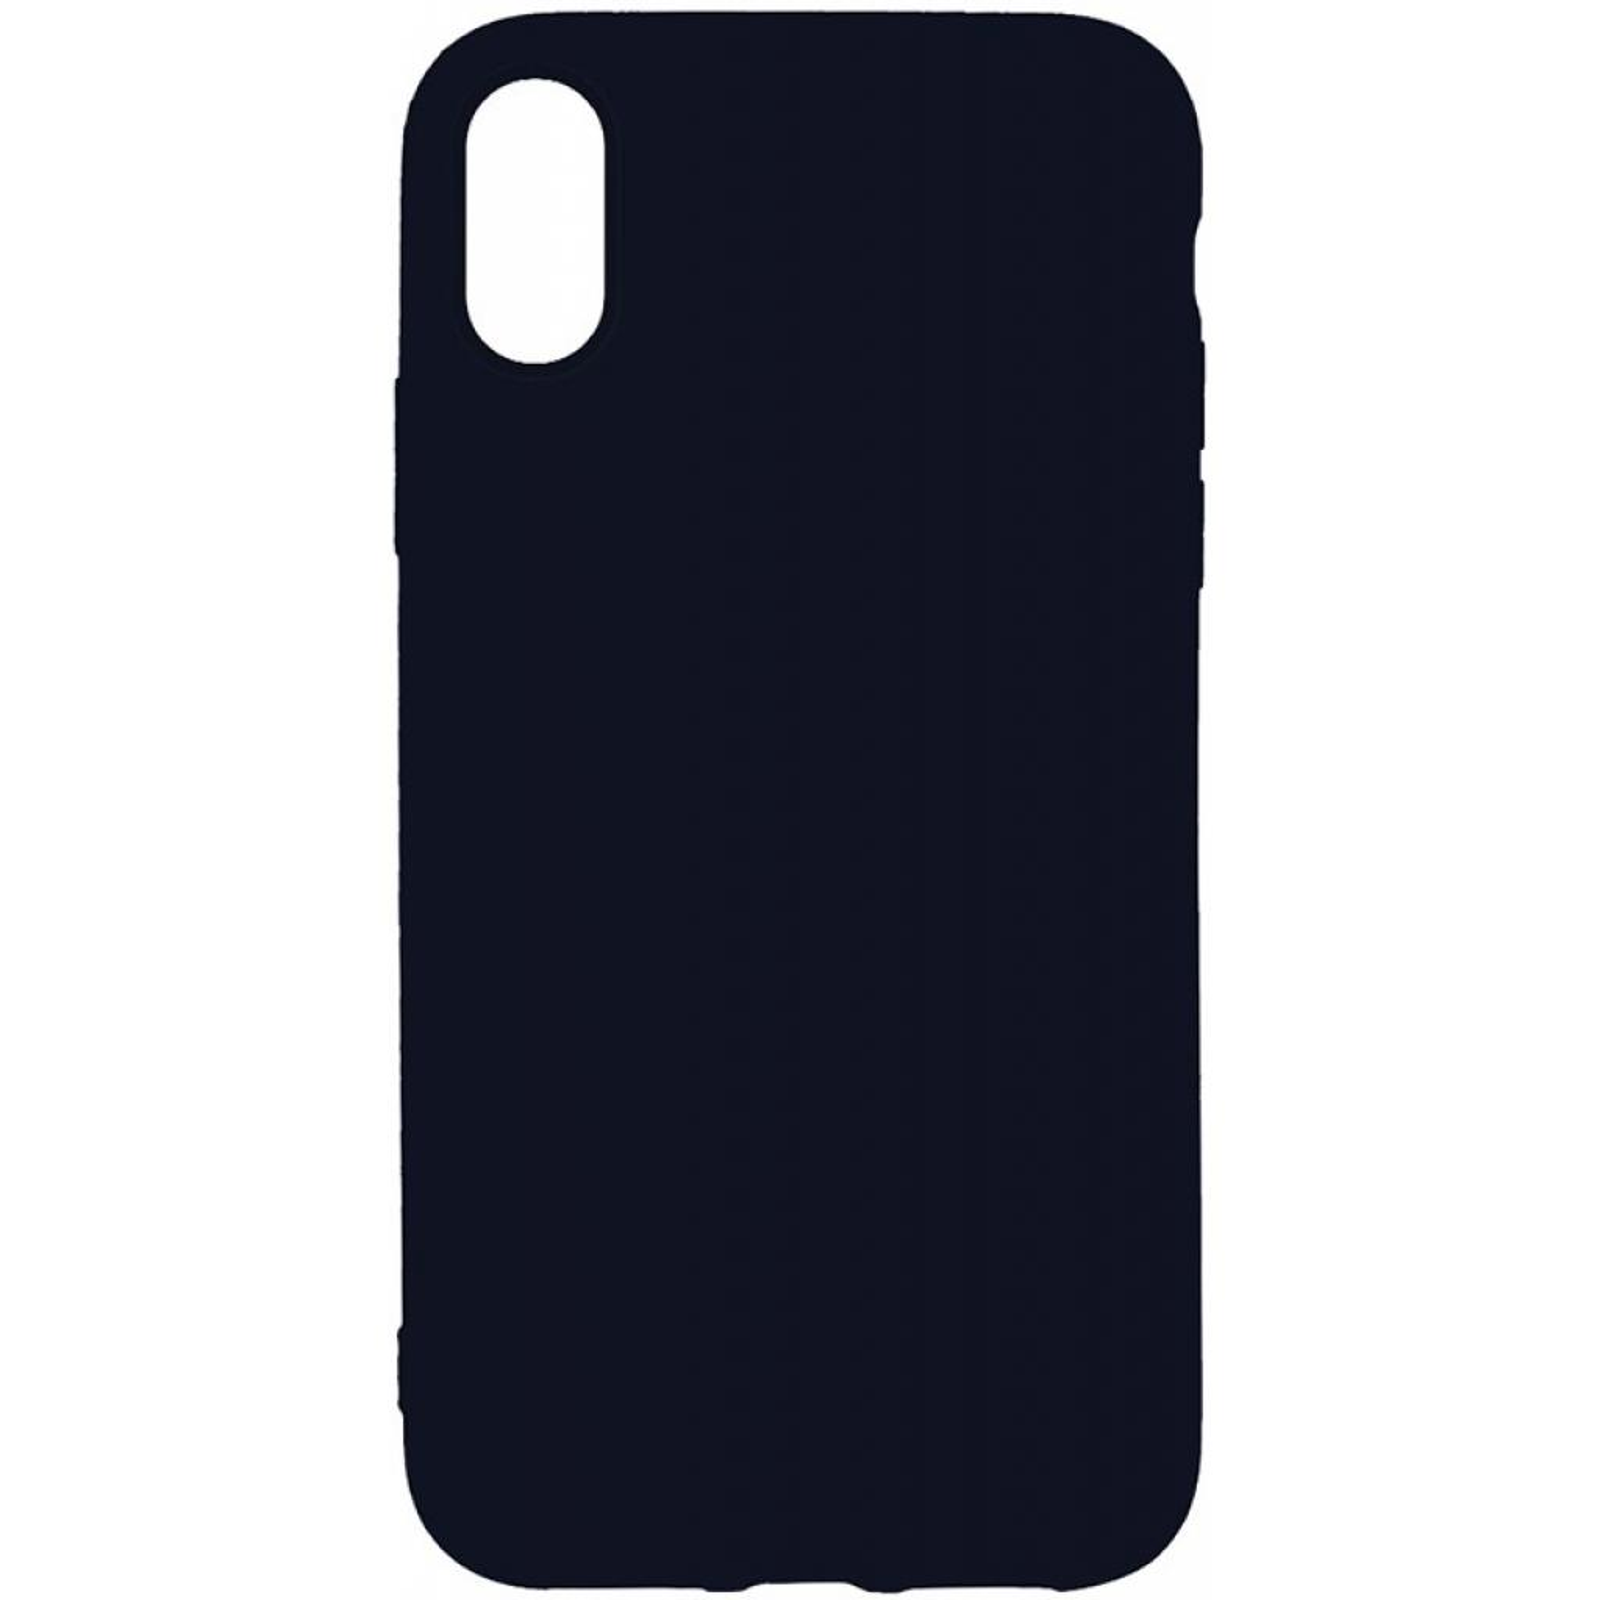 Чехол для моб. телефона Toto 1mm Matt TPU Case Apple iPhone X/XS Black (F_93936)